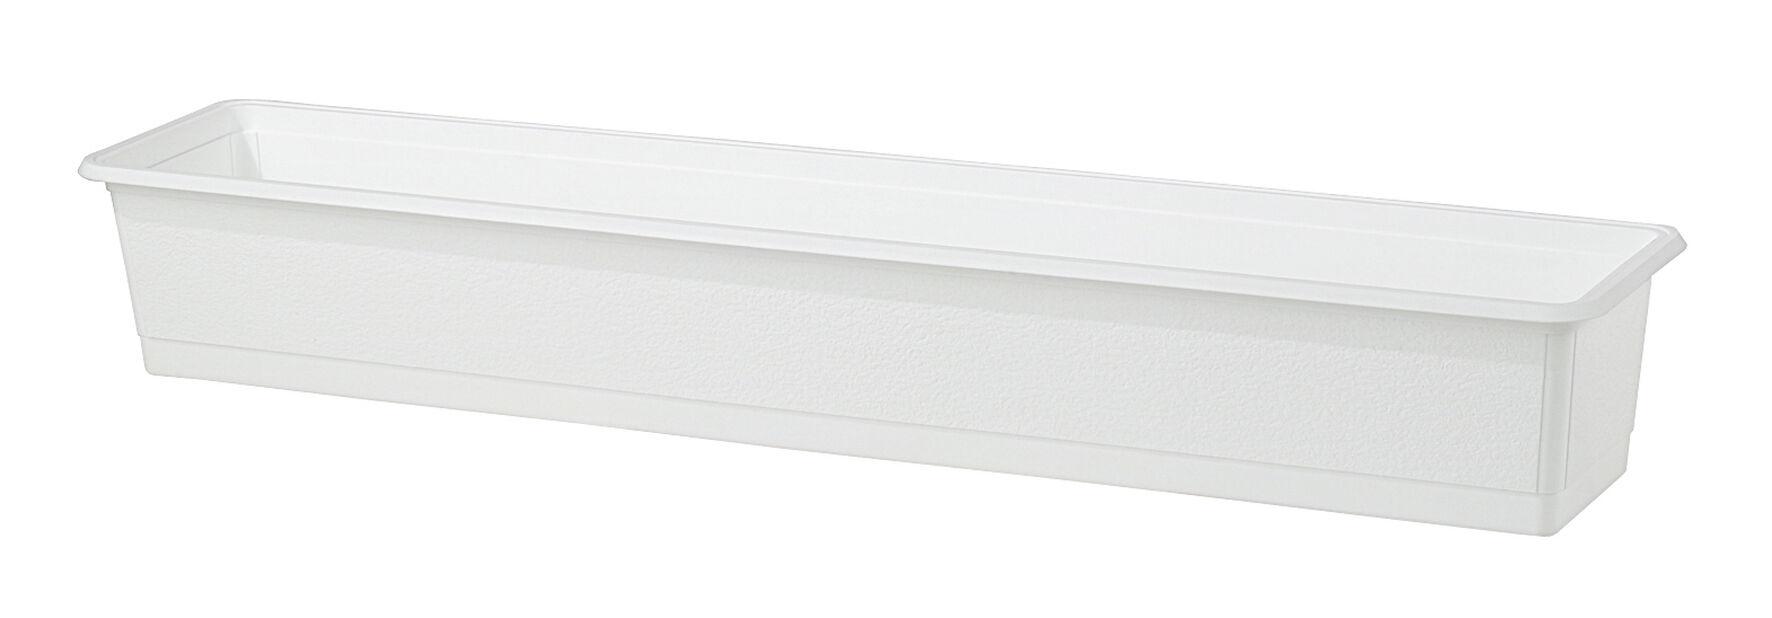 Balkongkasse Structure 90cm hvit